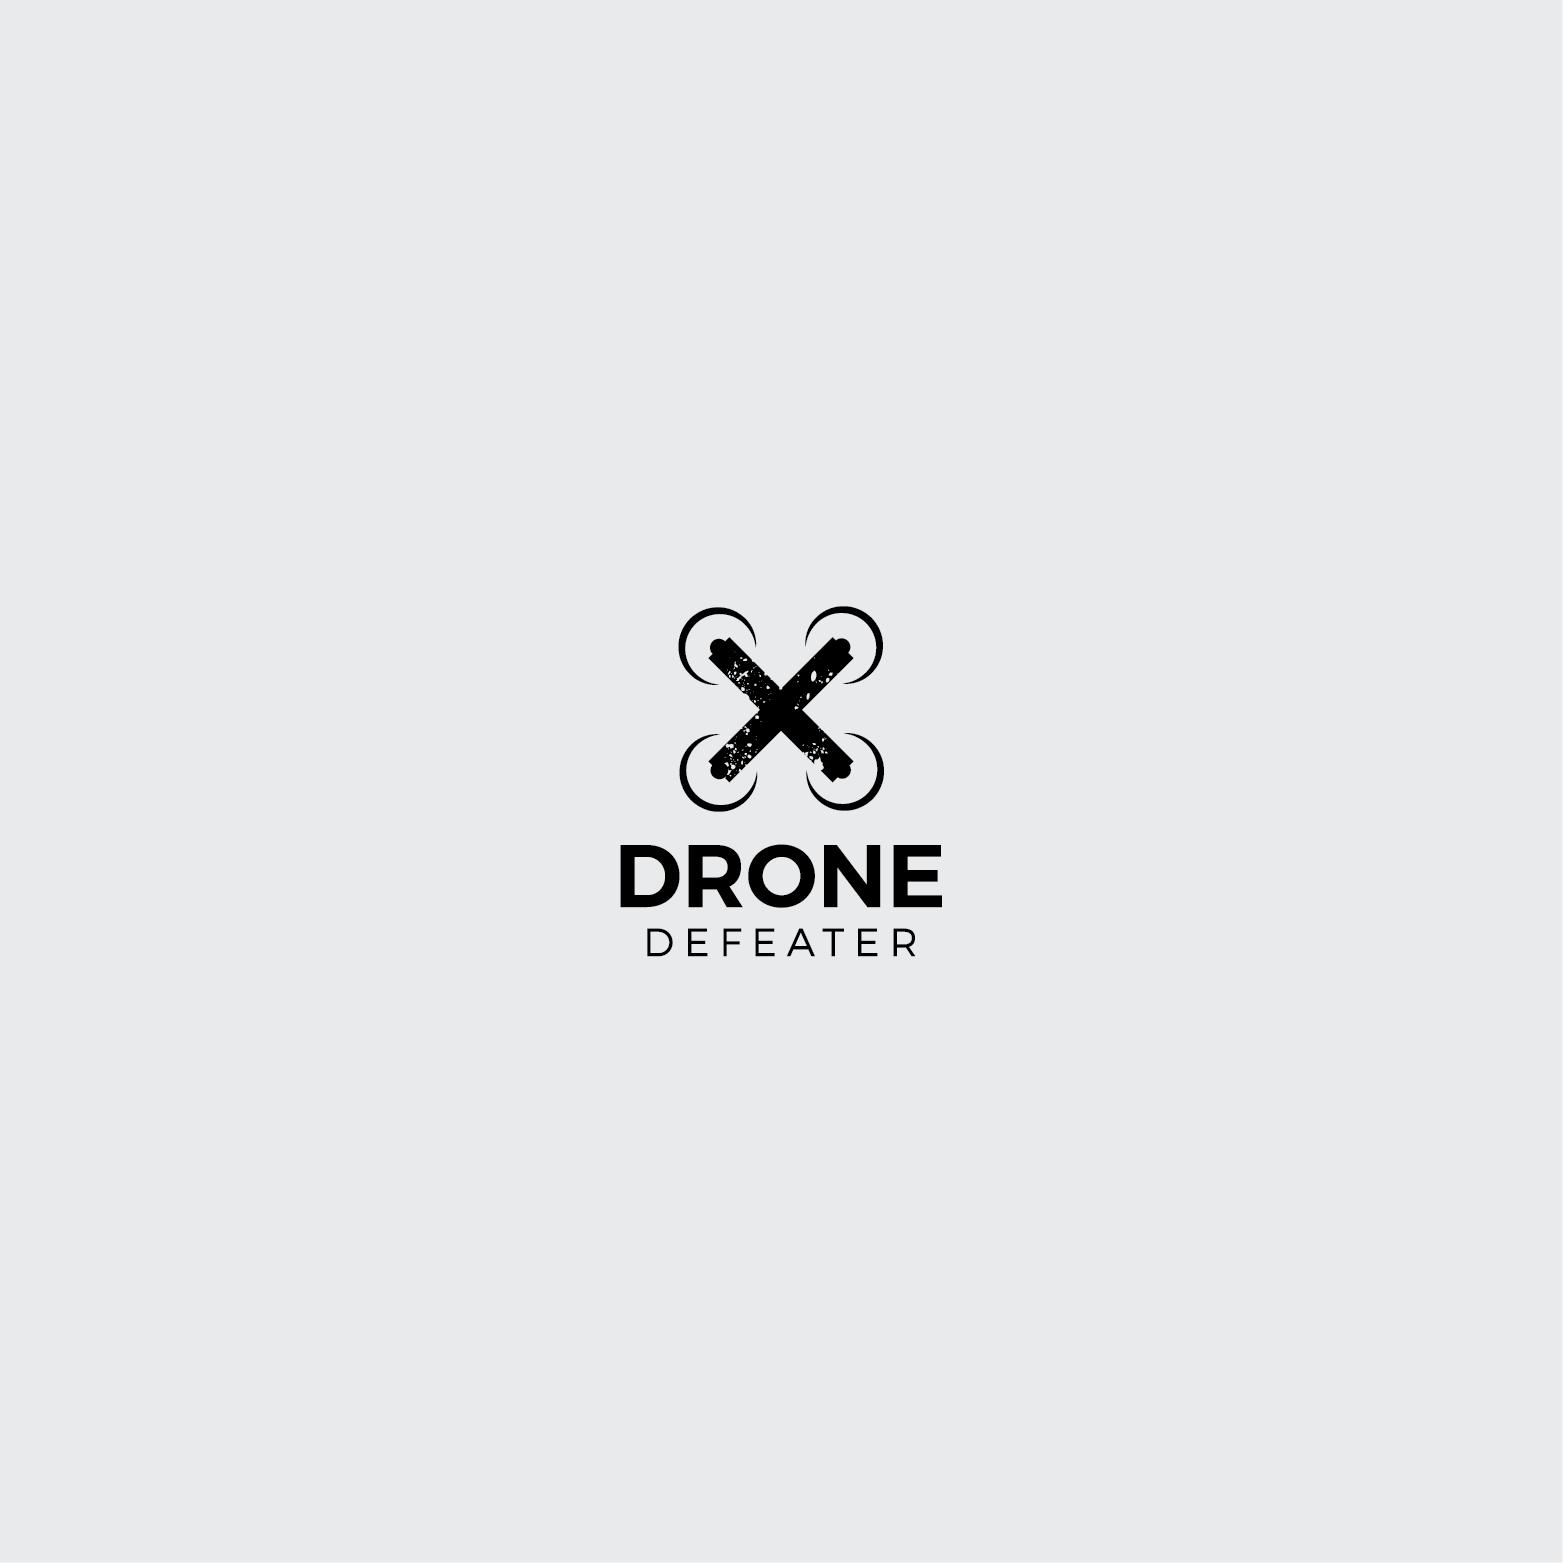 Logo Design by Rizky Adam - Entry No. 62 in the Logo Design Contest Artistic Logo Design for Drone Defeater.